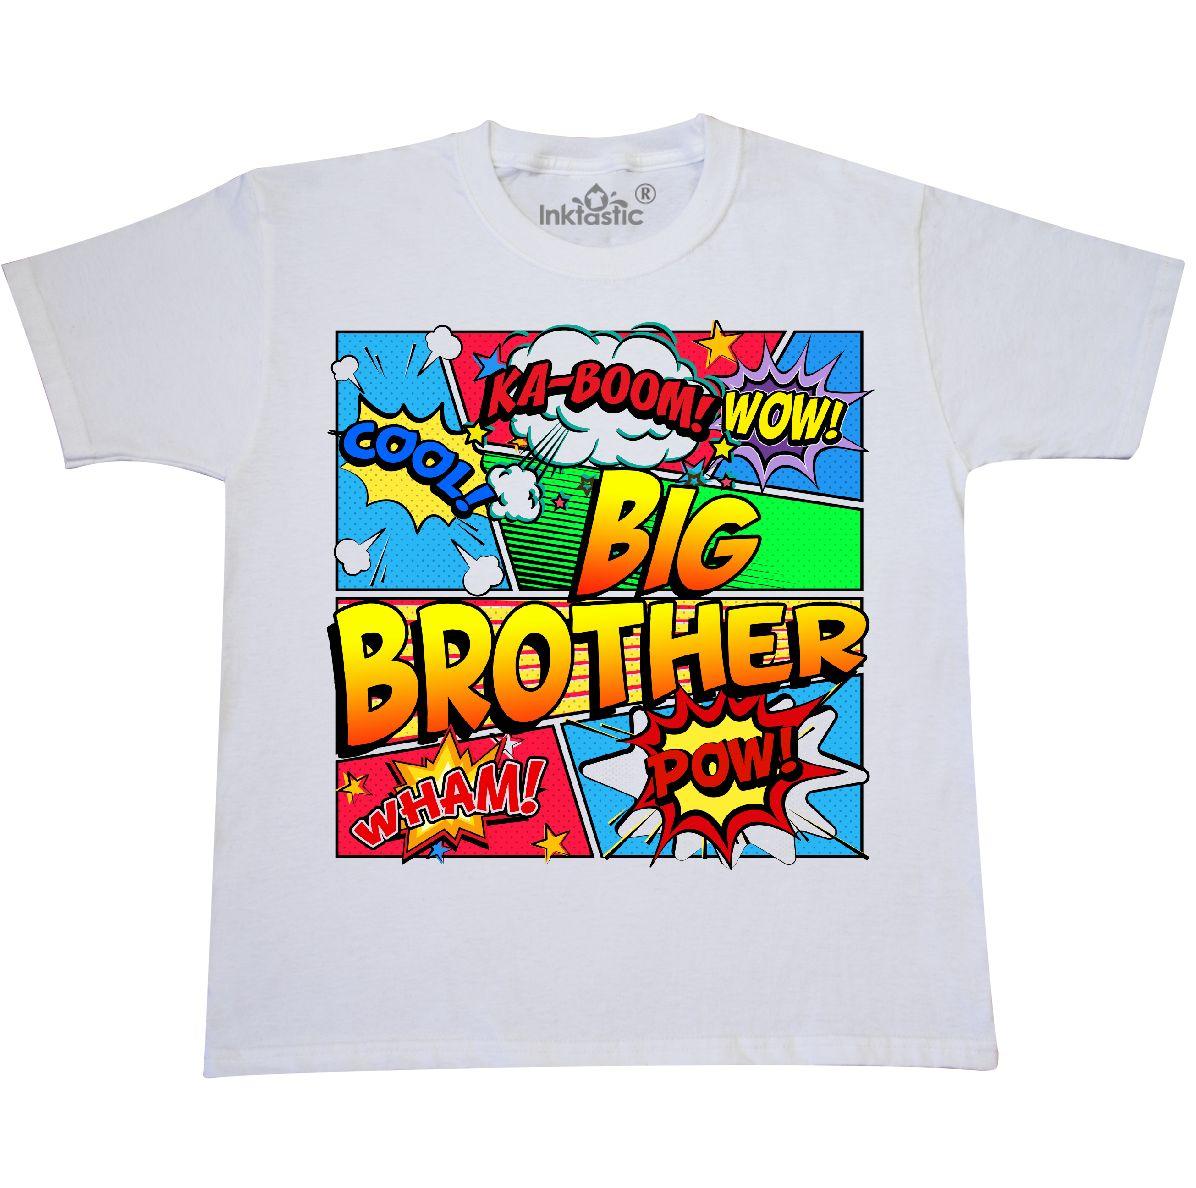 31b31e9b47d49 INKtastic Big Brother Comic Book Youth T-shirt Superhero Tee Kids ...